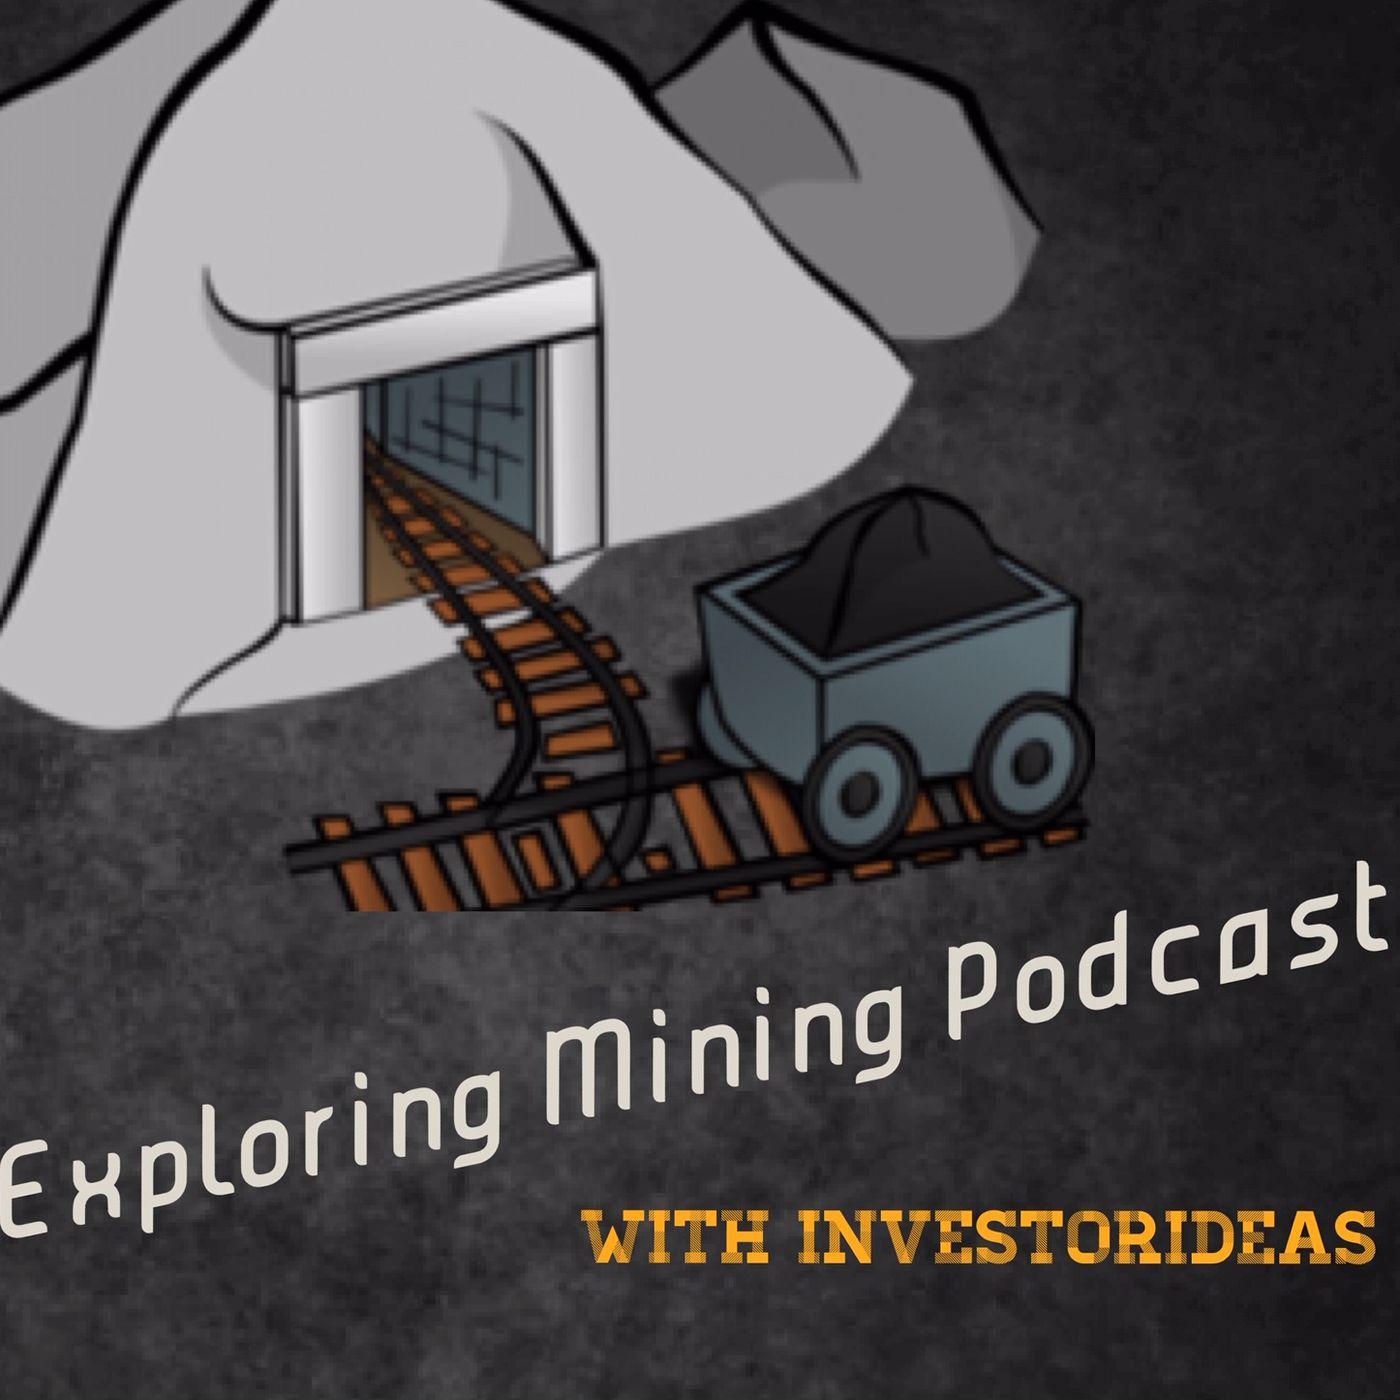 Exploring Mining Podcast Episode 129: News from (ASX: NCM) (TSXV: HIGH) (TSX: LN) (TSXV: ECC)